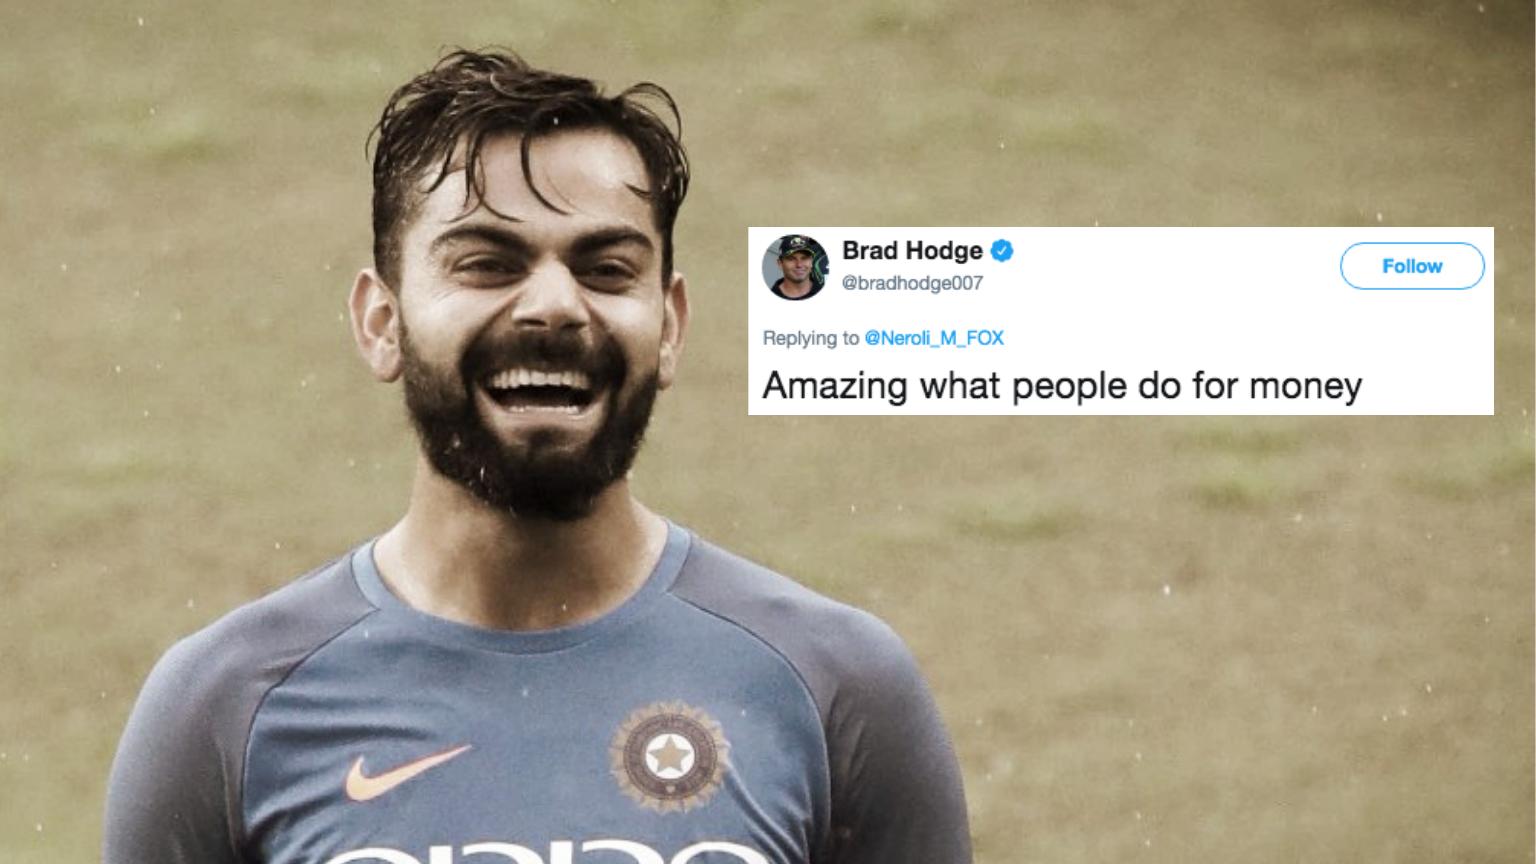 'Amazing What People Do for Money': Hodge Trolled for Kohli Tweet